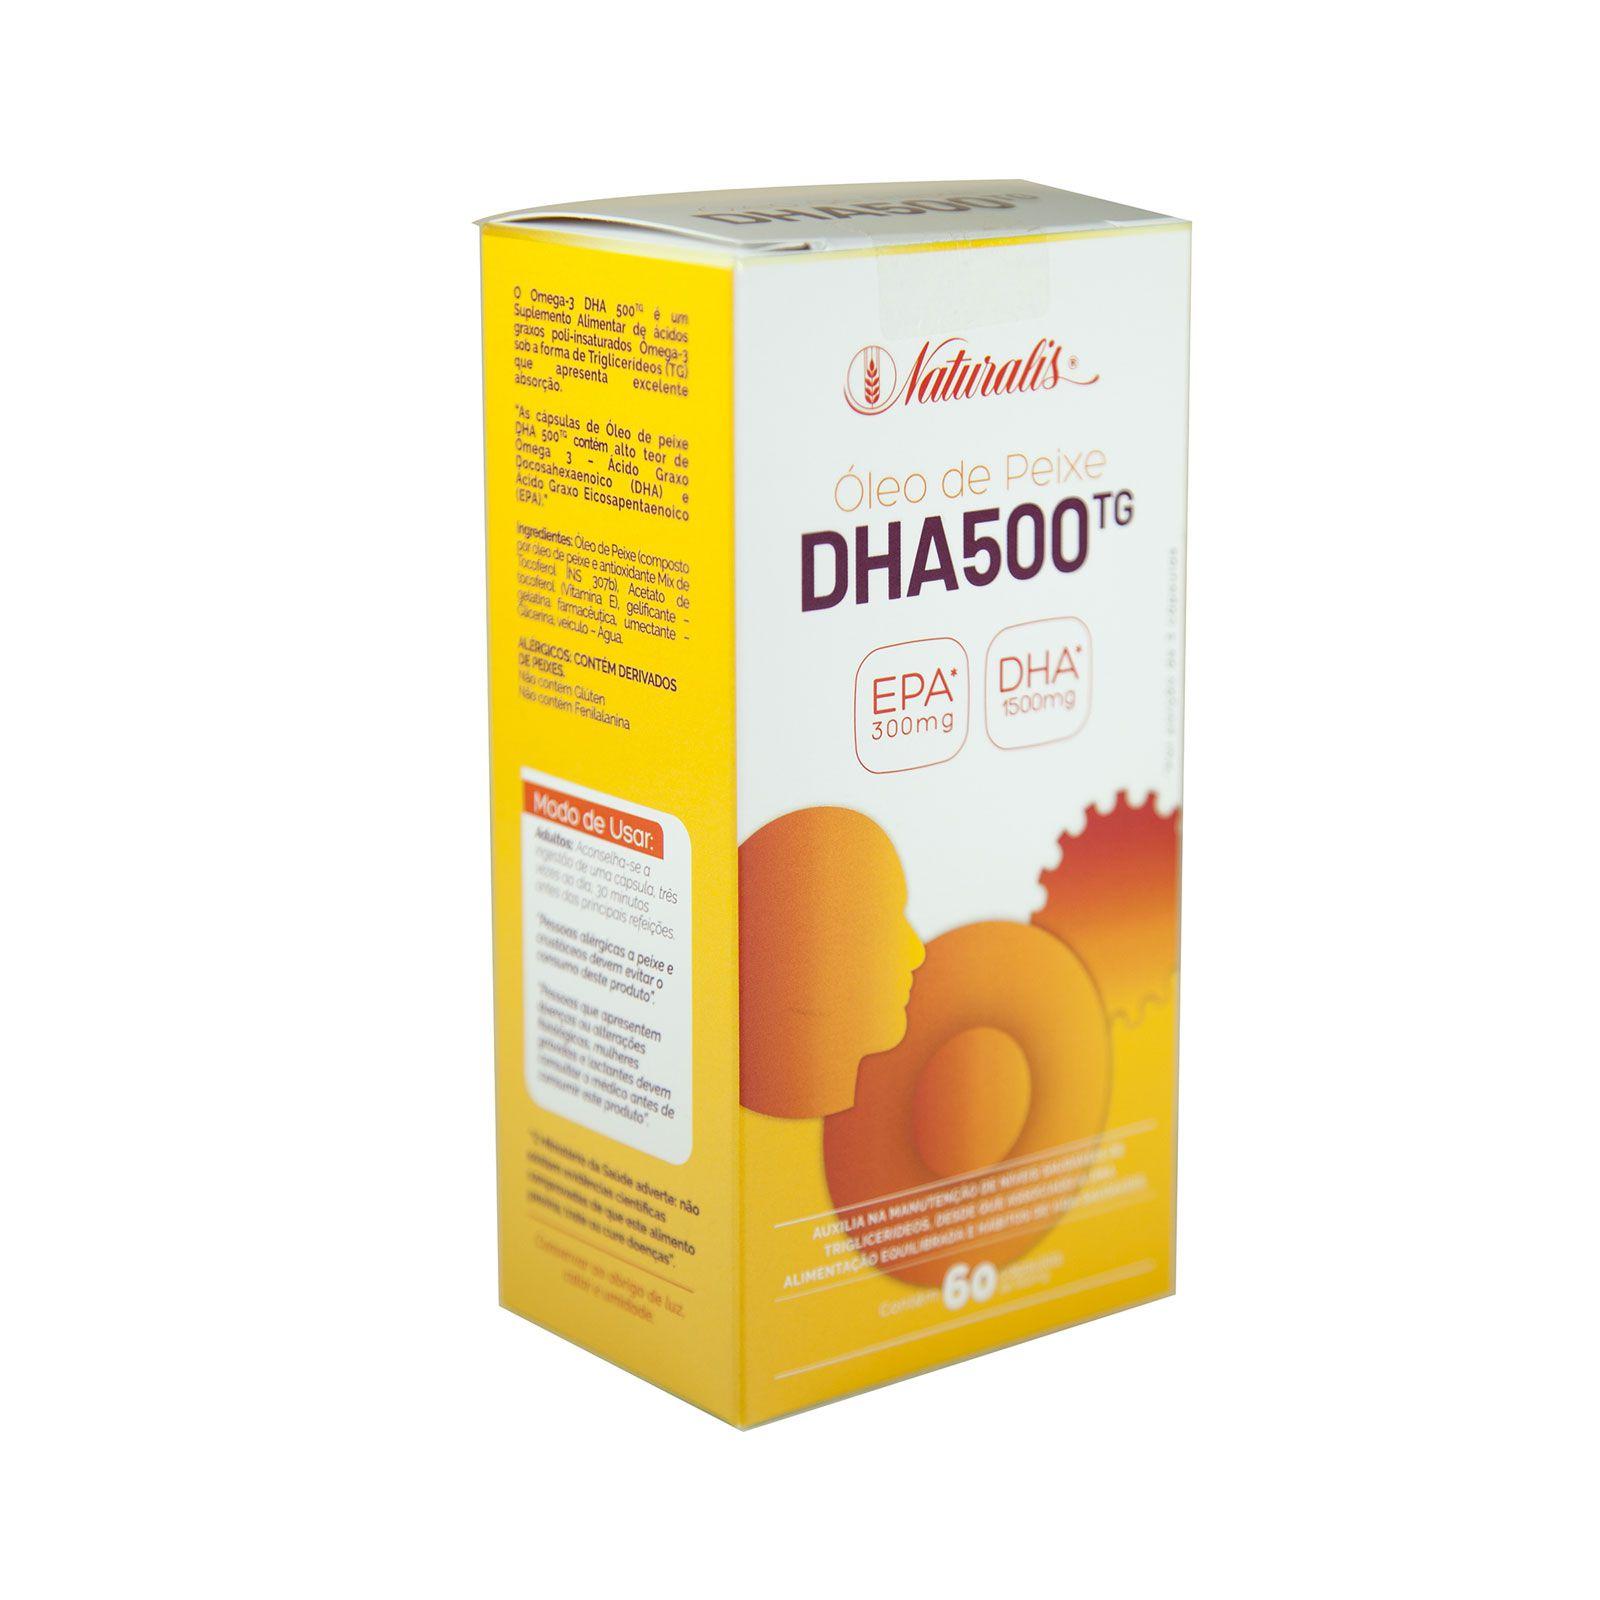 Omega-3 DHA 500 Naturalis 60 Cápsulas